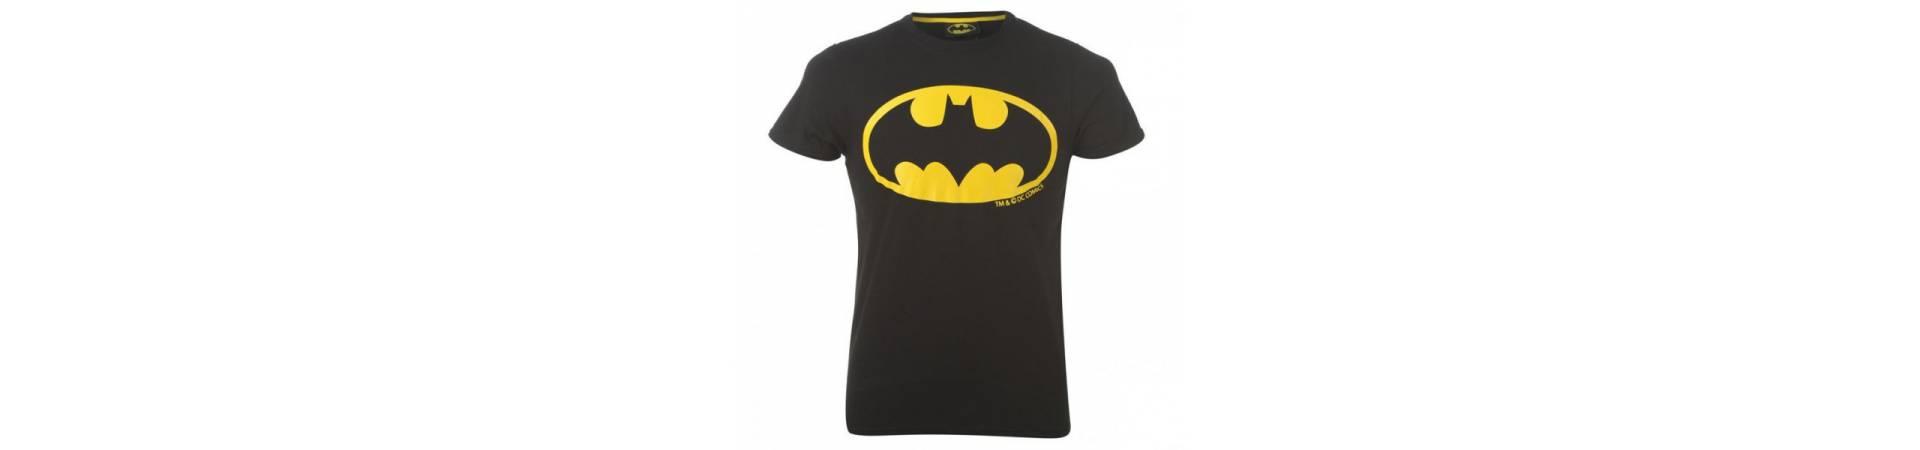 Batman - Ruhanemű